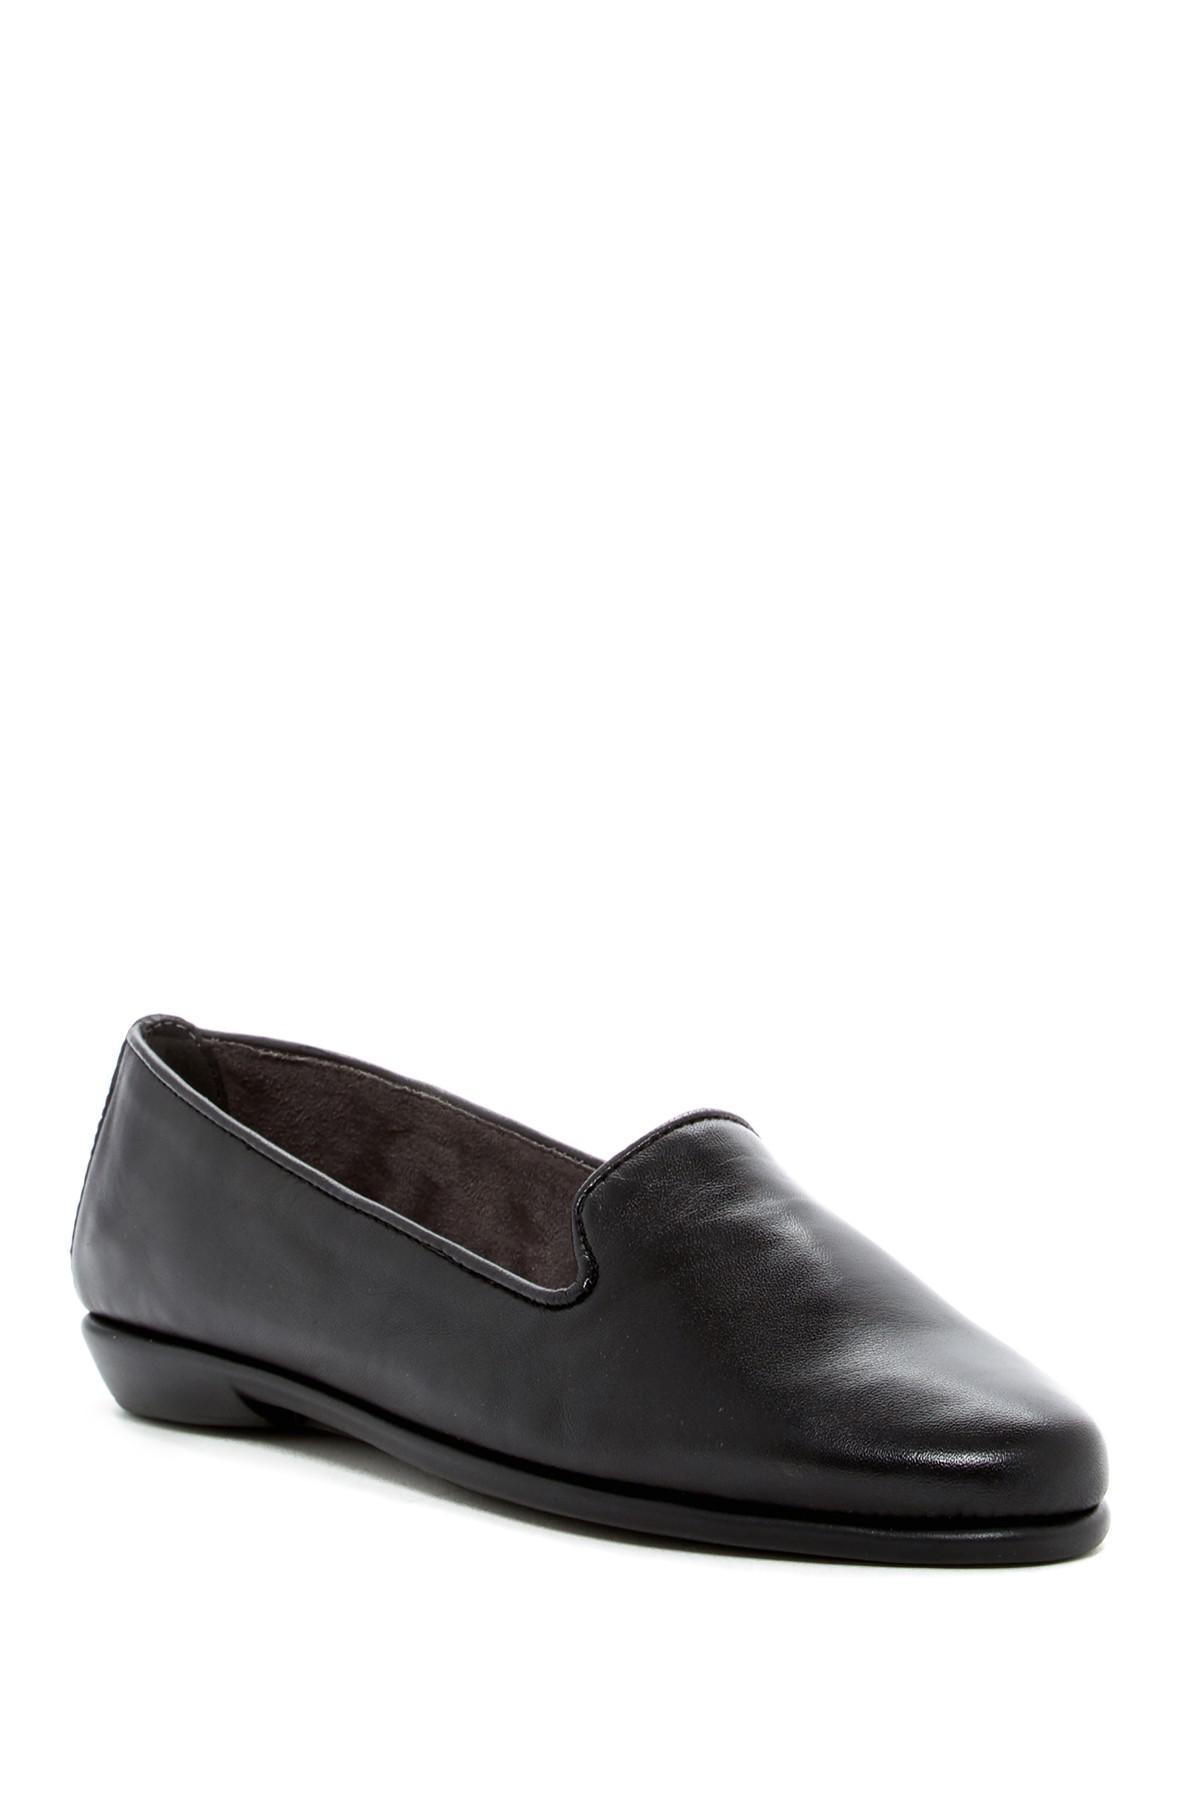 Lyst Aerosoles Betunia Smoking Slipper In Black For Men